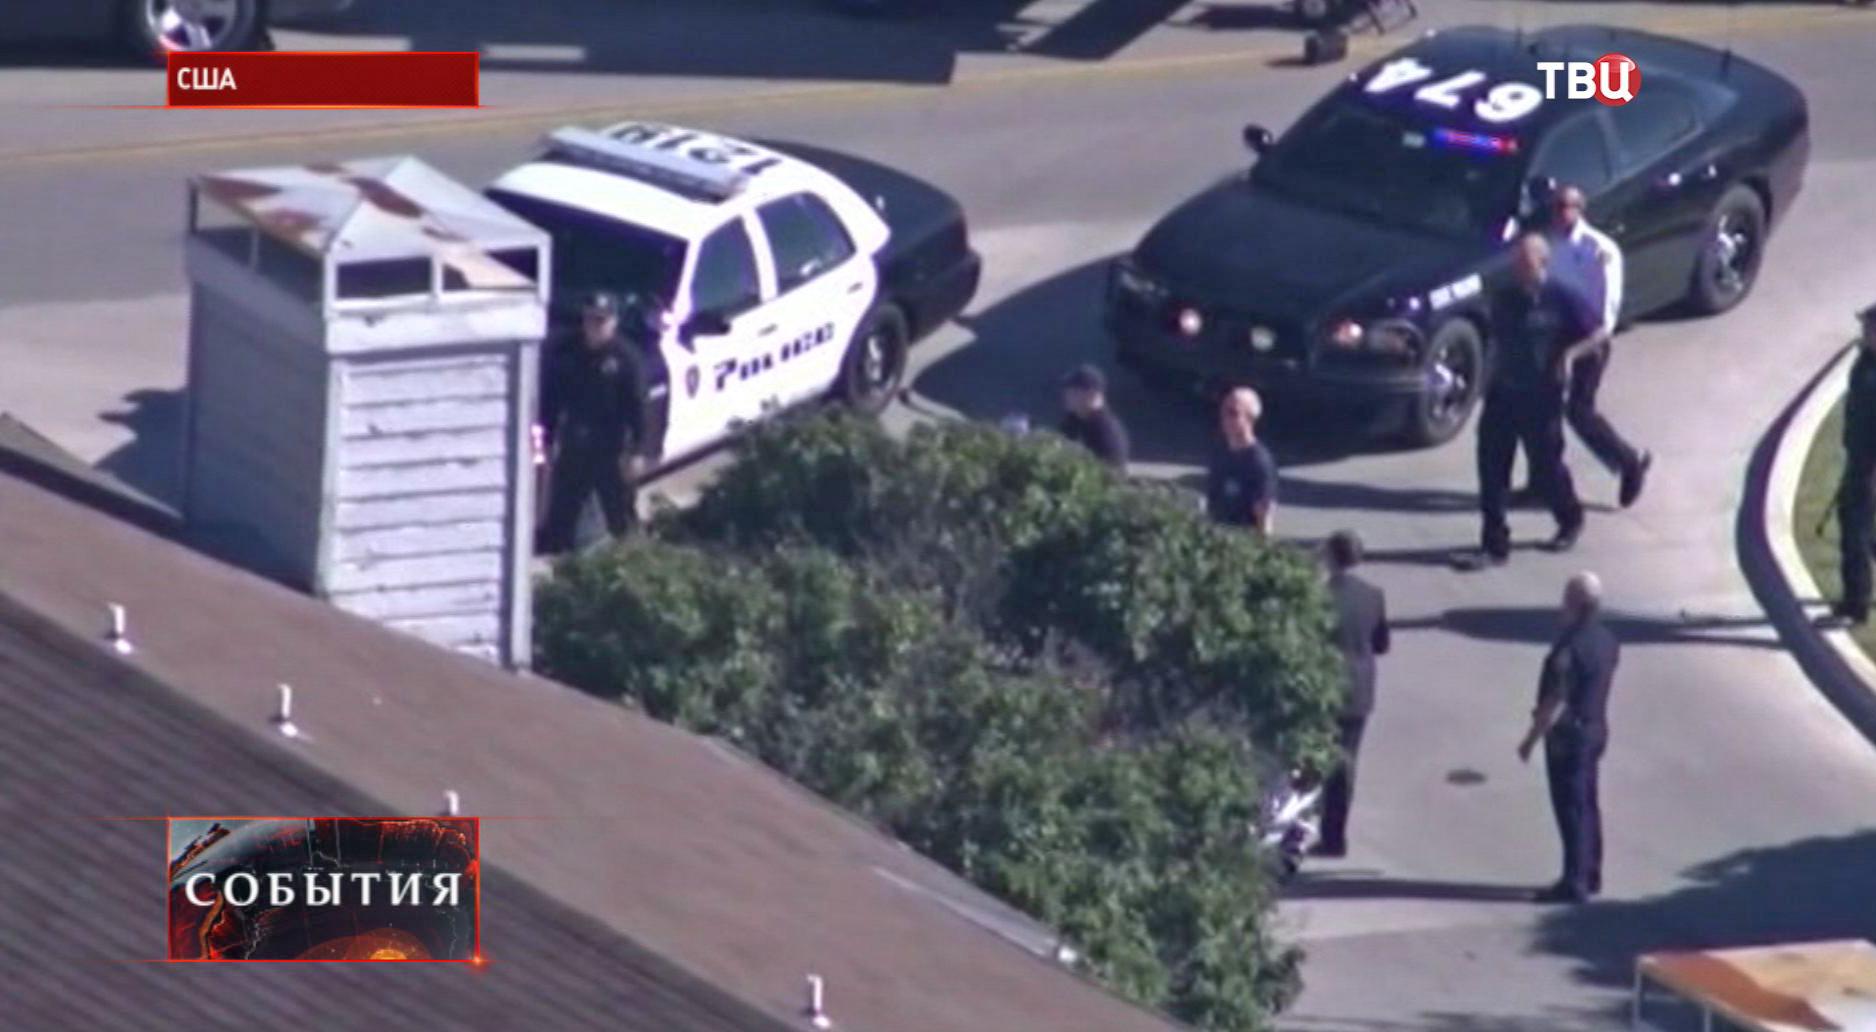 Полиция на месте захвата заложников в офисном здании